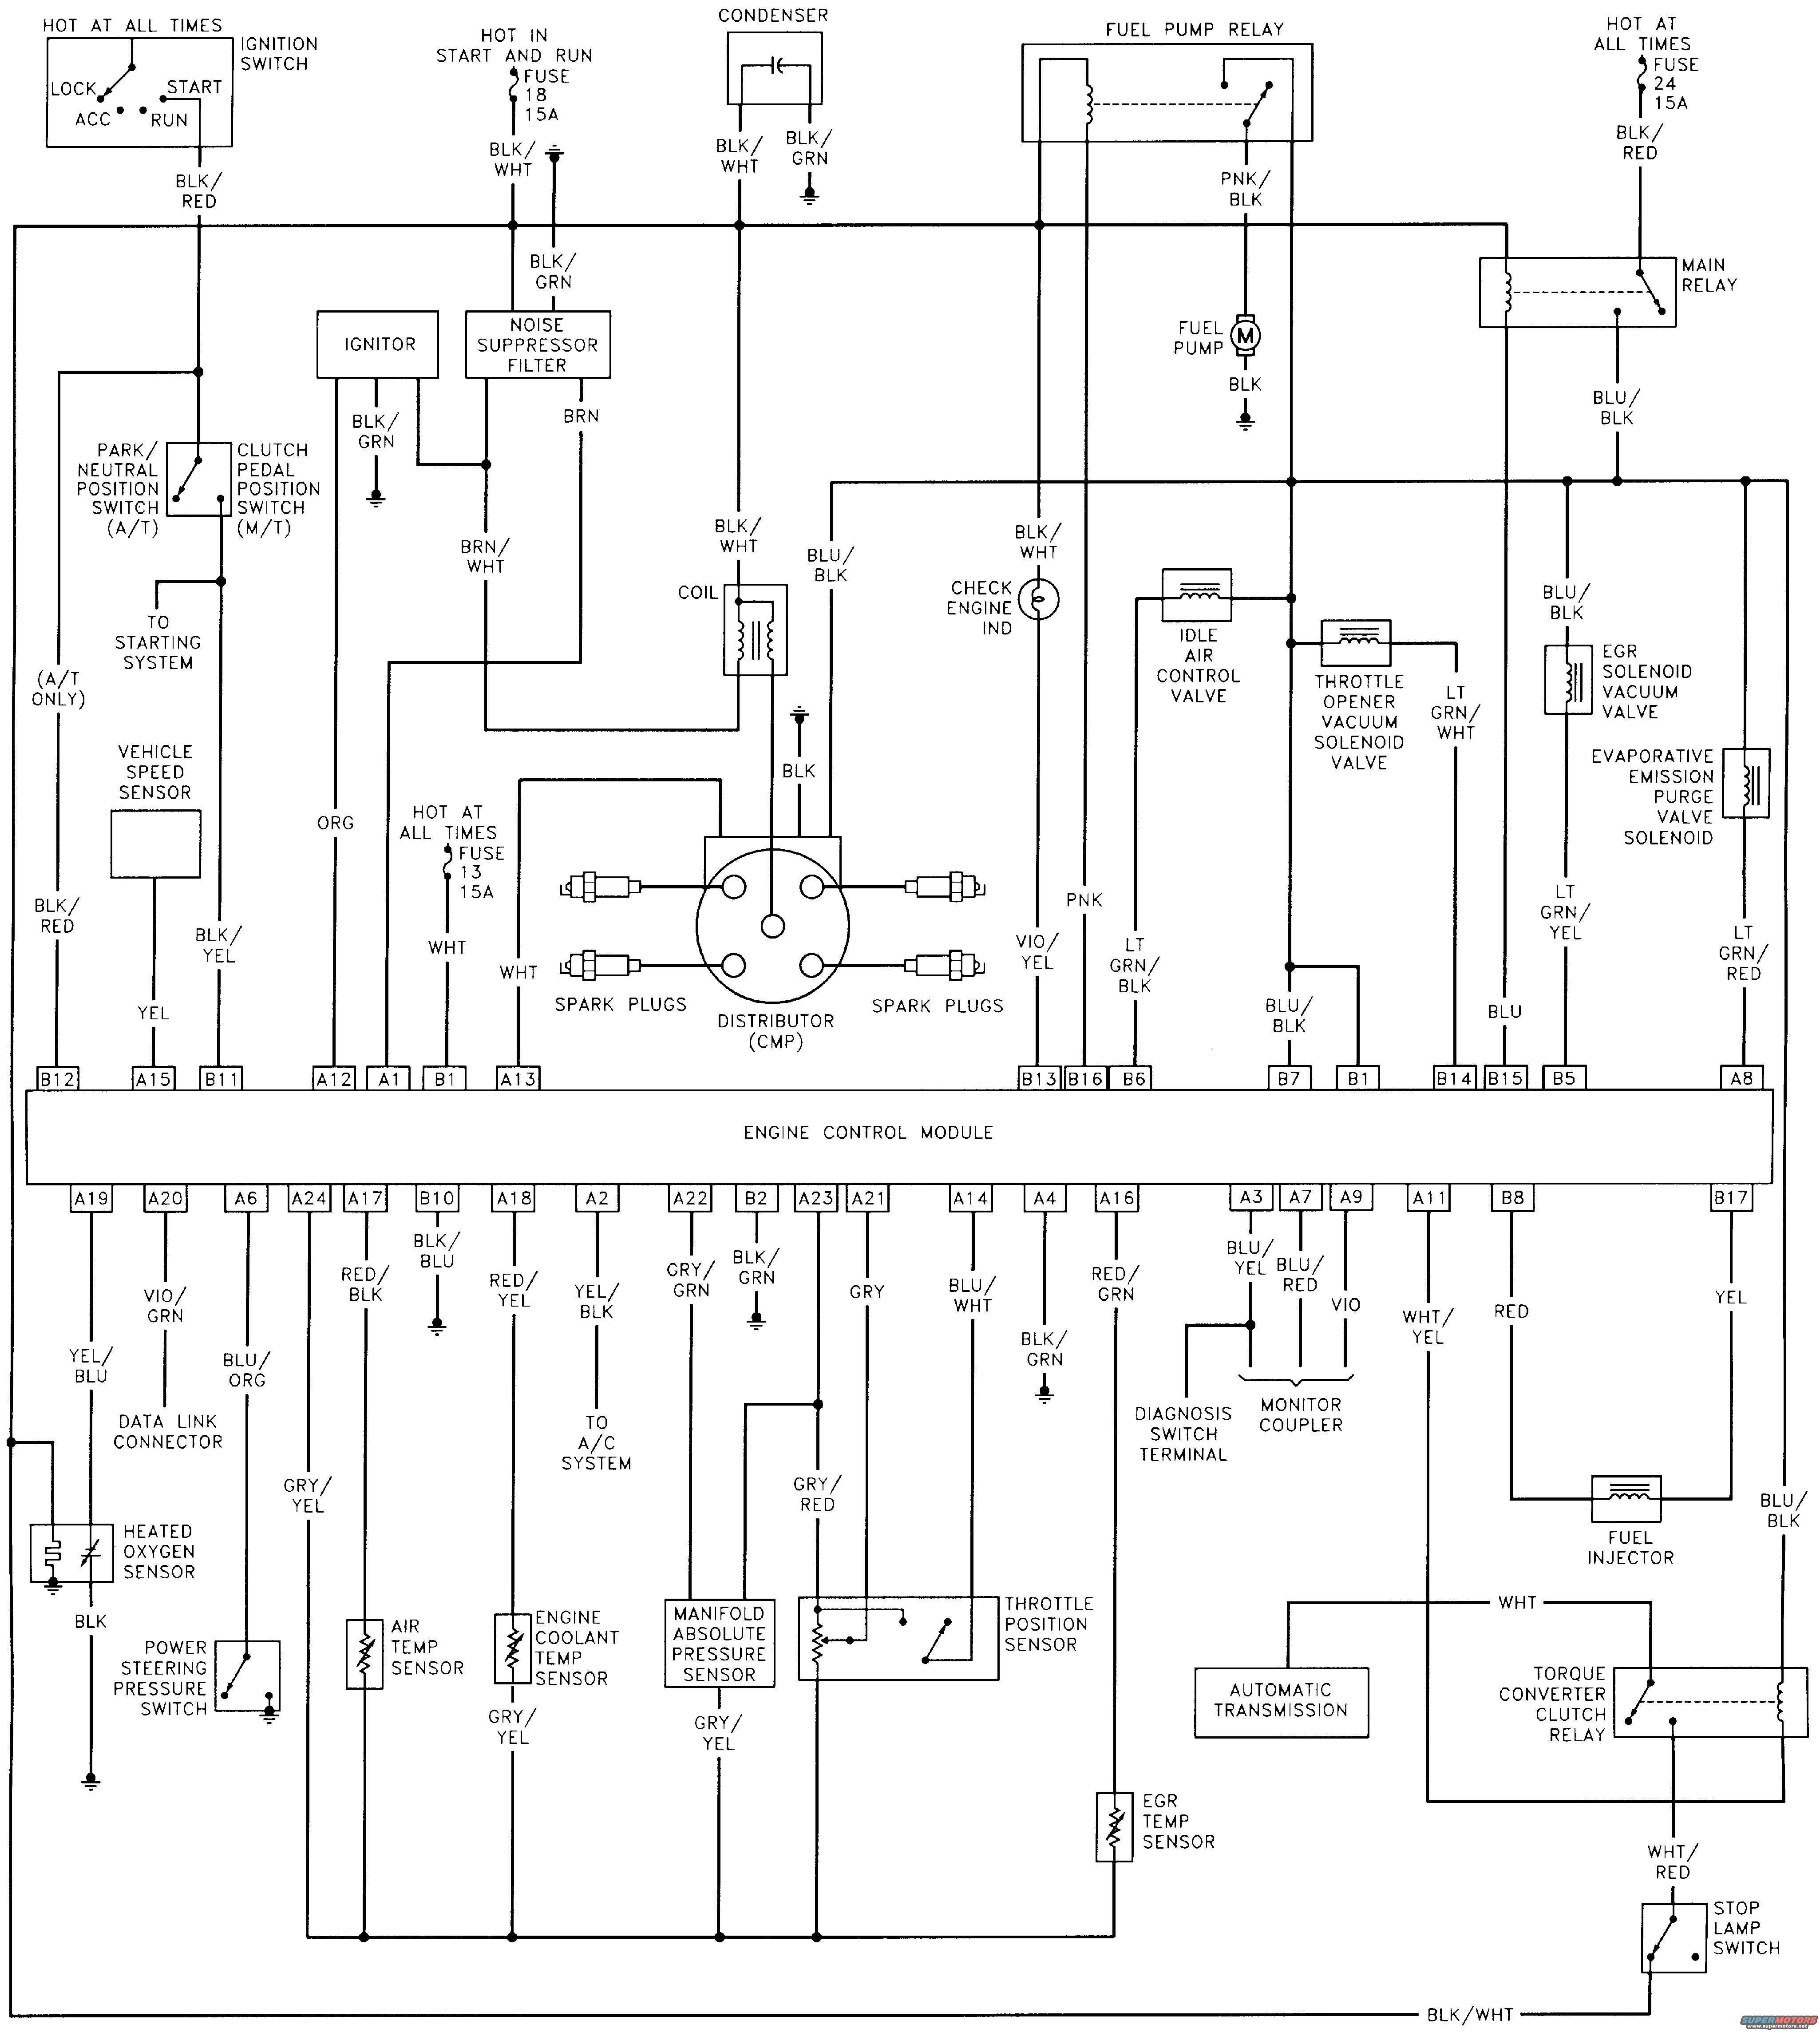 suzuki sidekick wiring diagram pc keyboard 94 geo tracker 1 6l engine free image for user